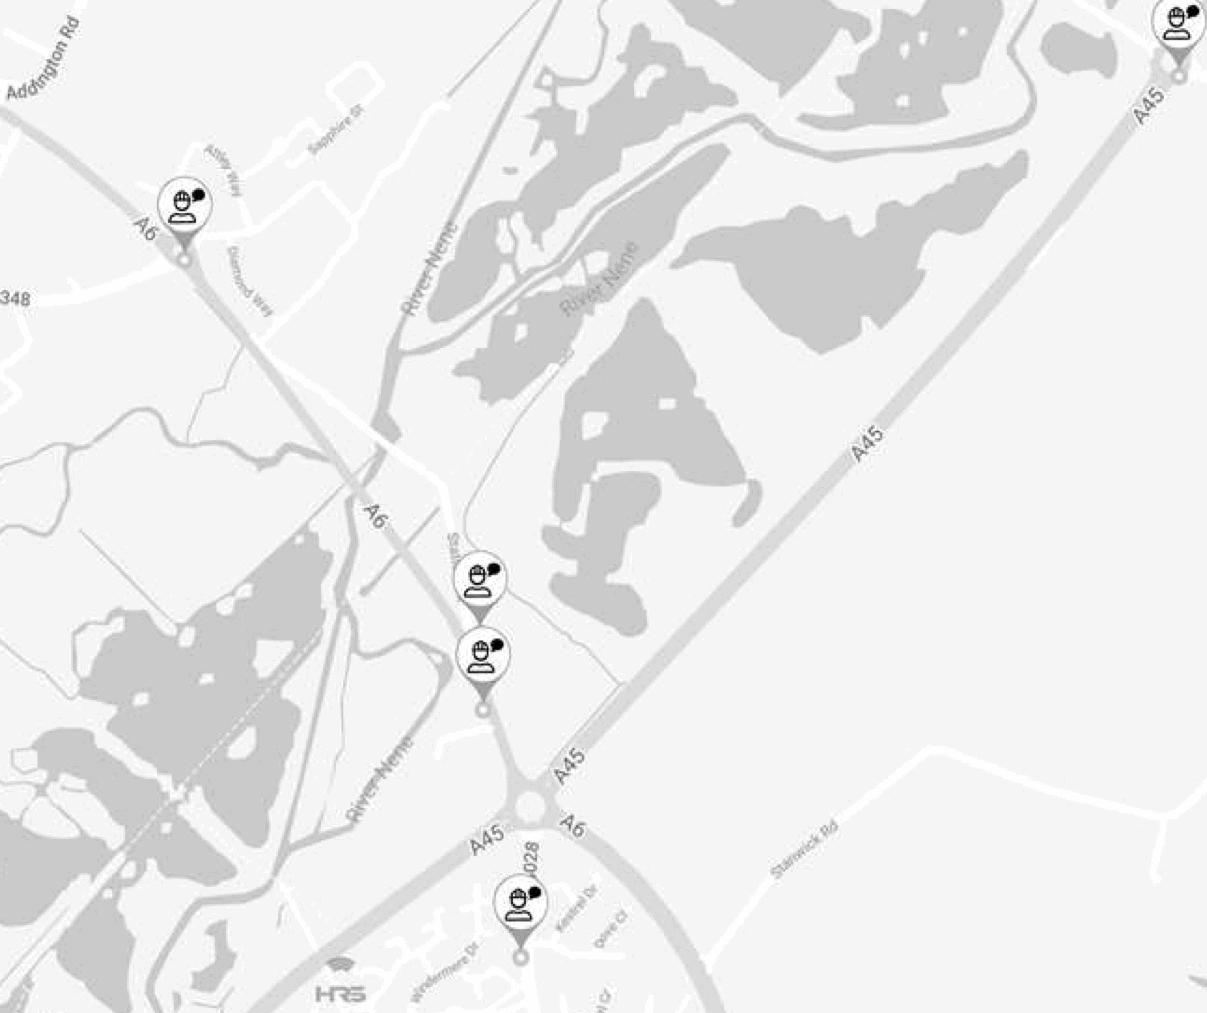 cs-img-map